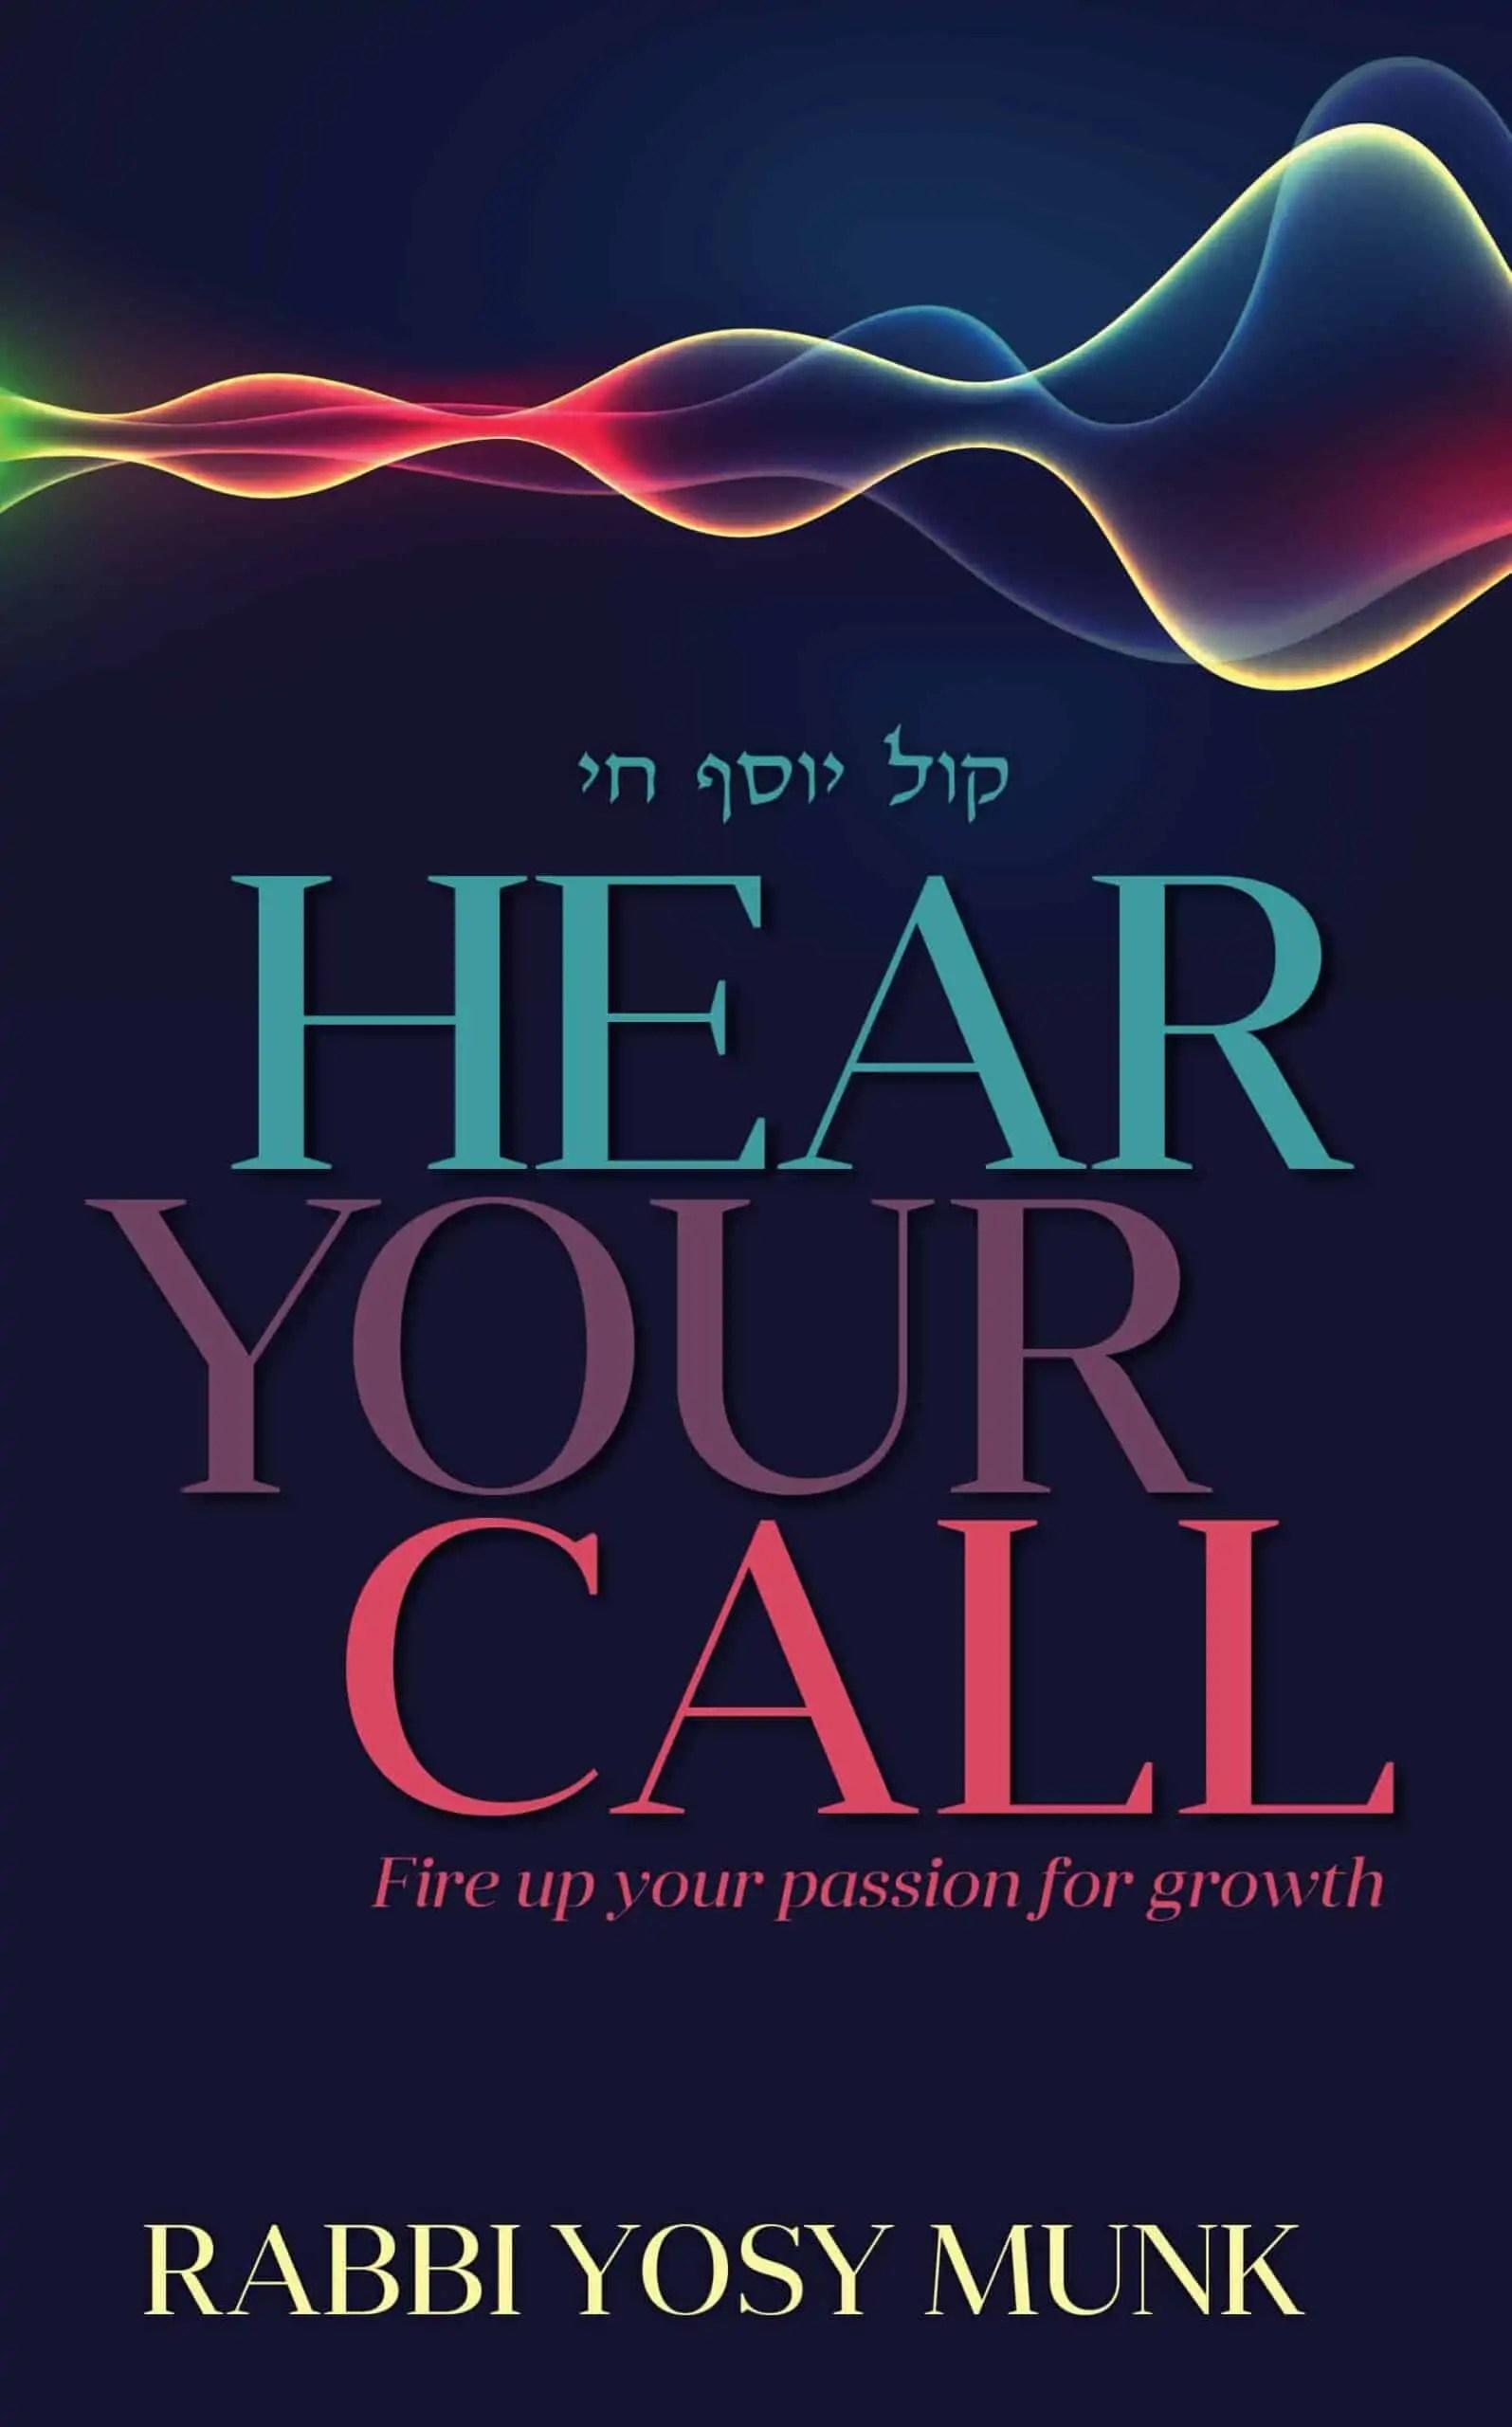 Rabbi Yosy Munk